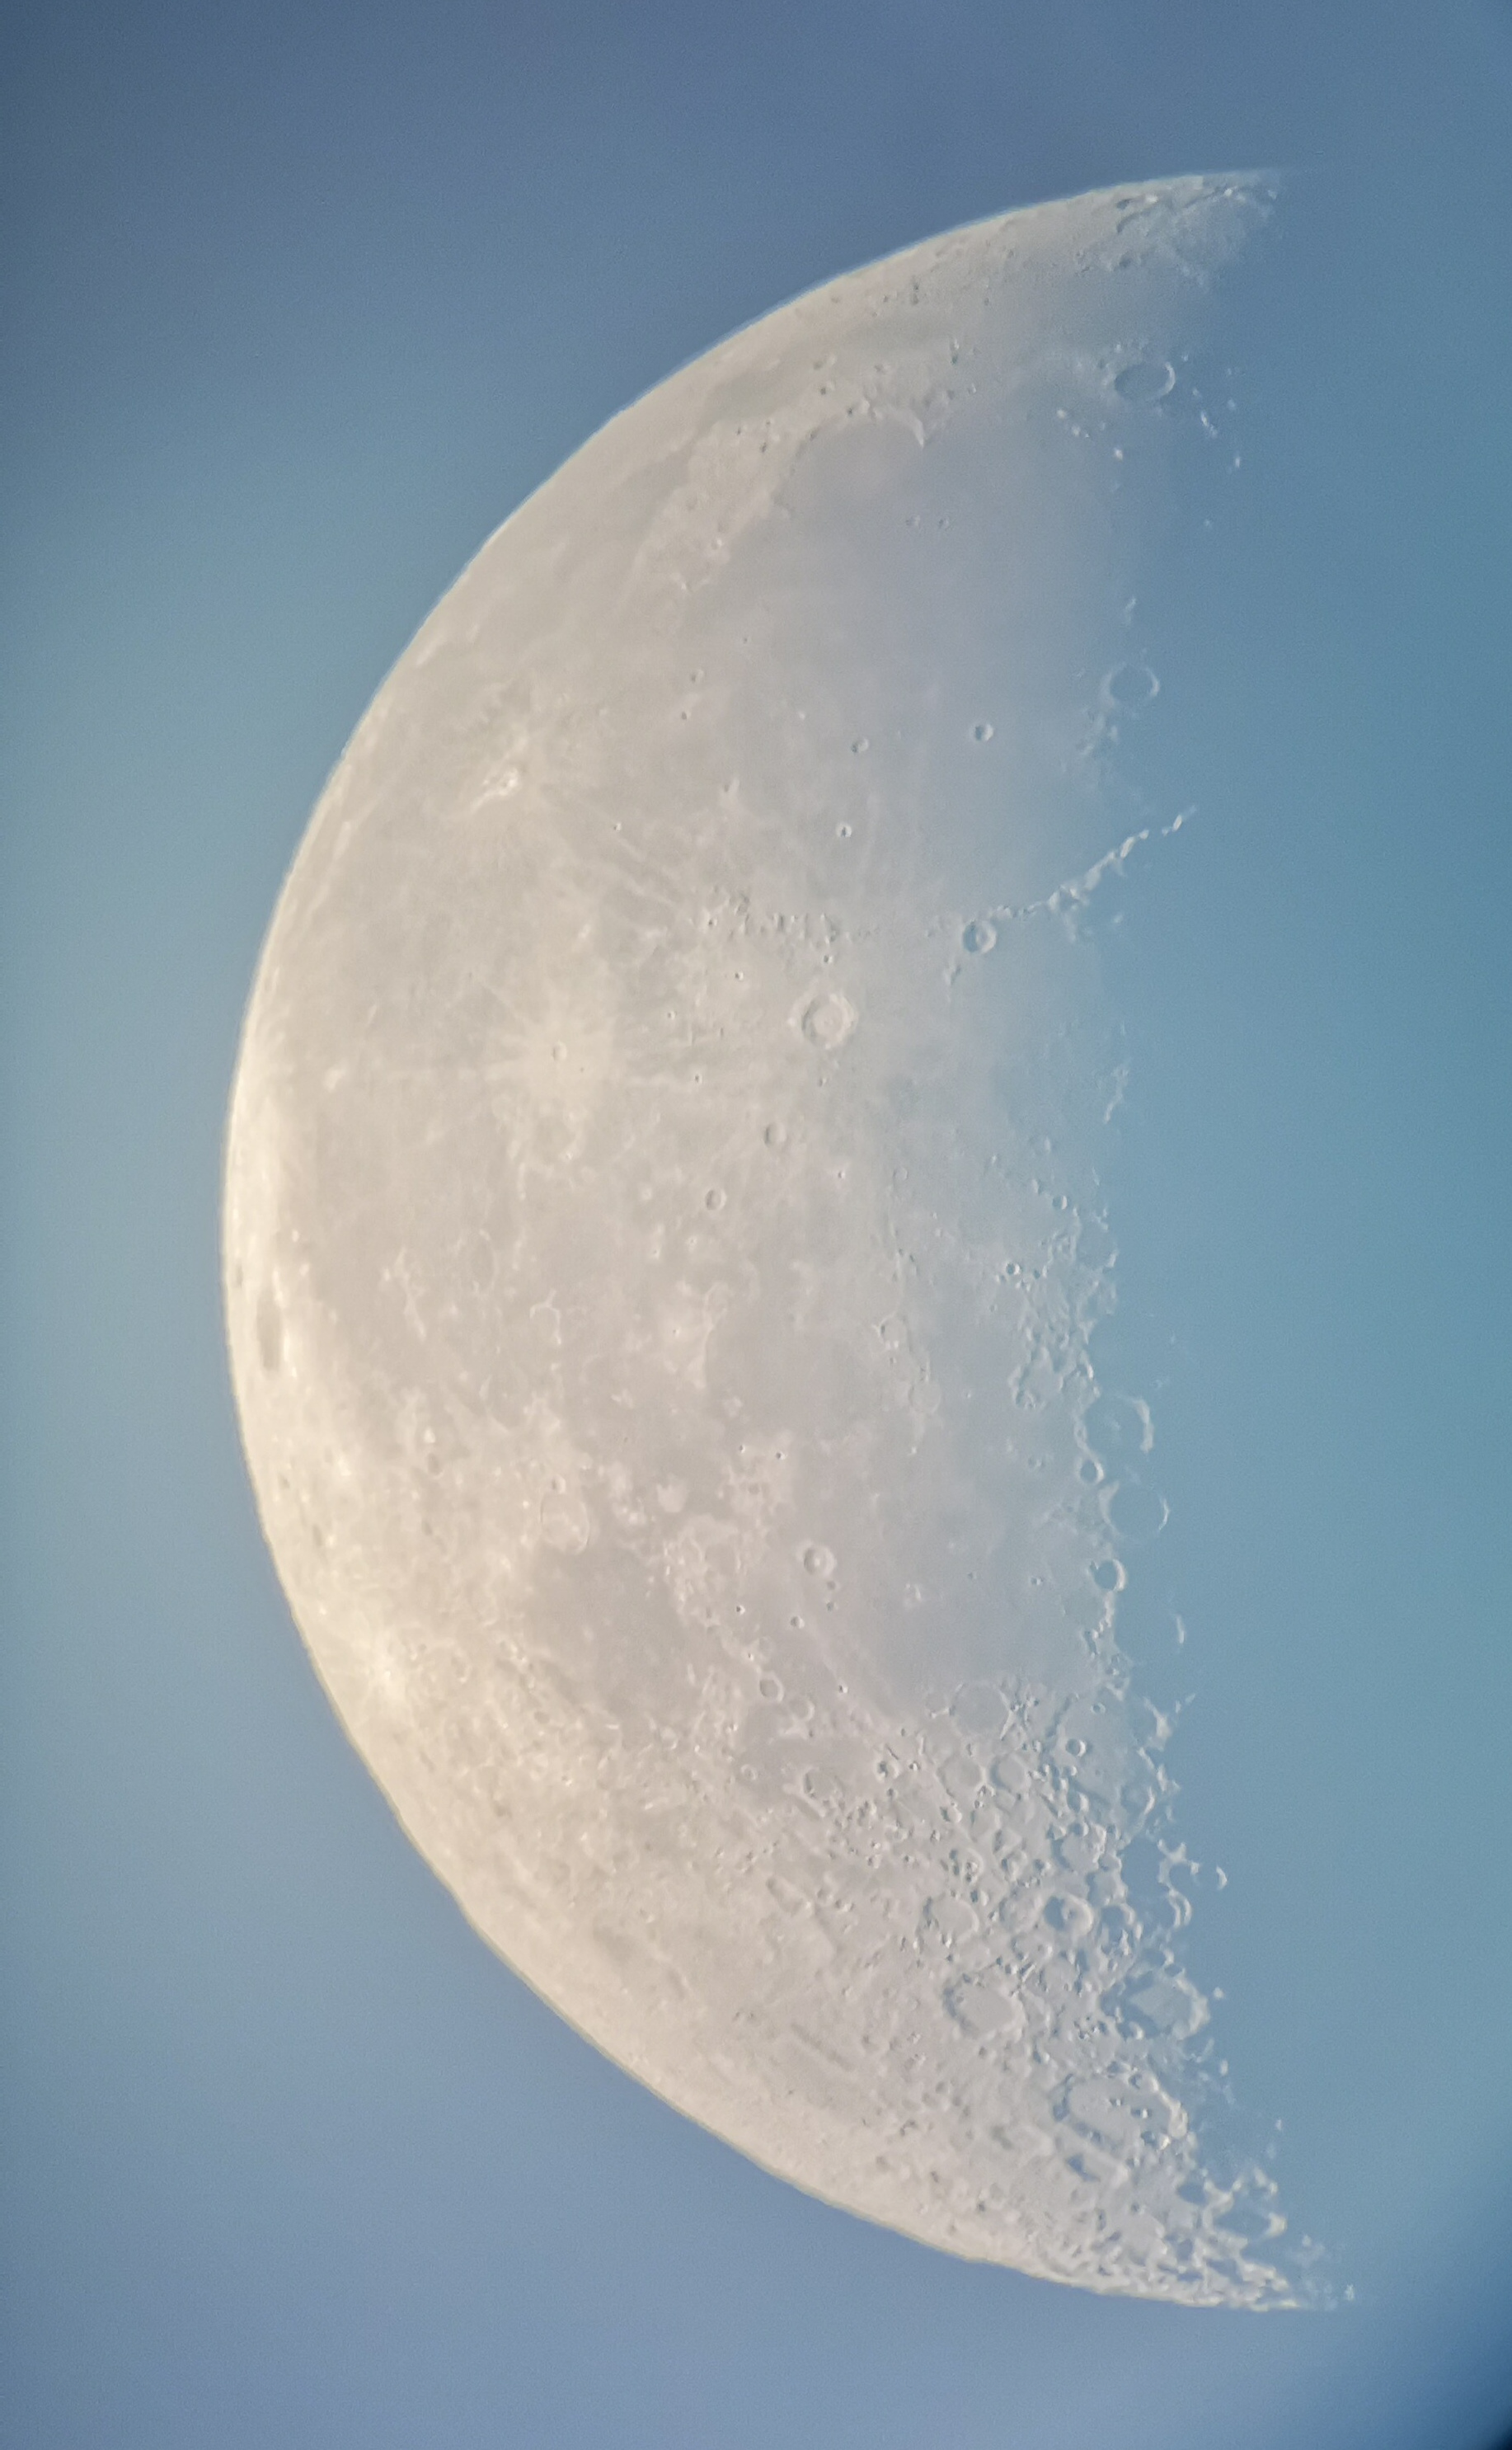 Lune_20190227_075142__descendante.jpg